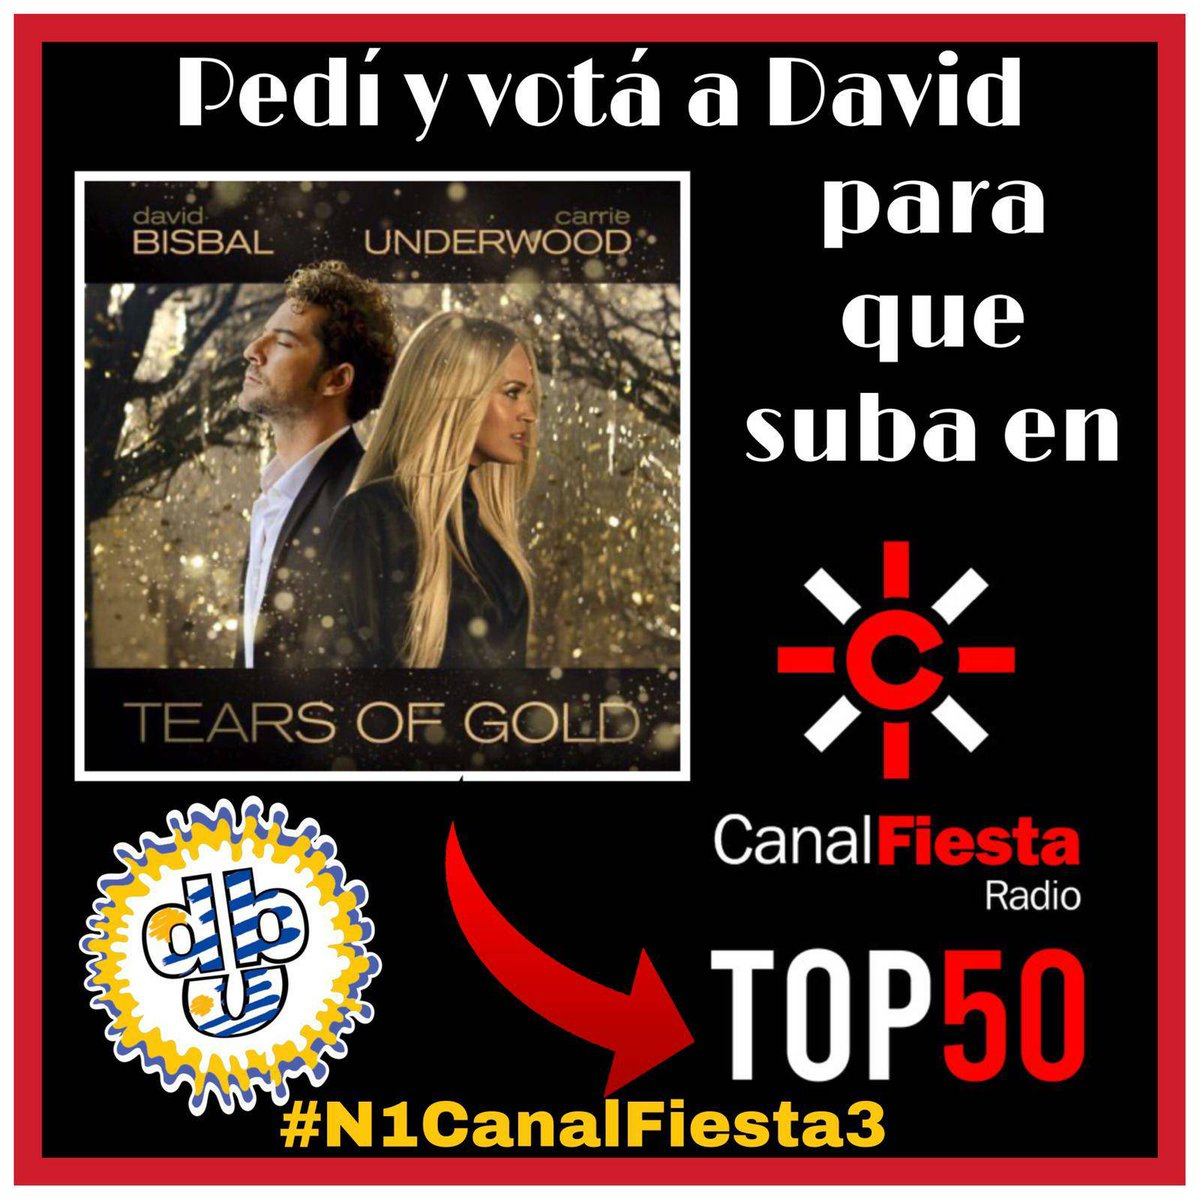 Nuestra canción favorita para #N1CanalFiesta3 @canalfiesta es #TearsOfGold de @davidbisbal y @carrieunderwood @dominguezja @UniversalSpain @FCDavidBisbalUY #FCDavidBisbalUruguay